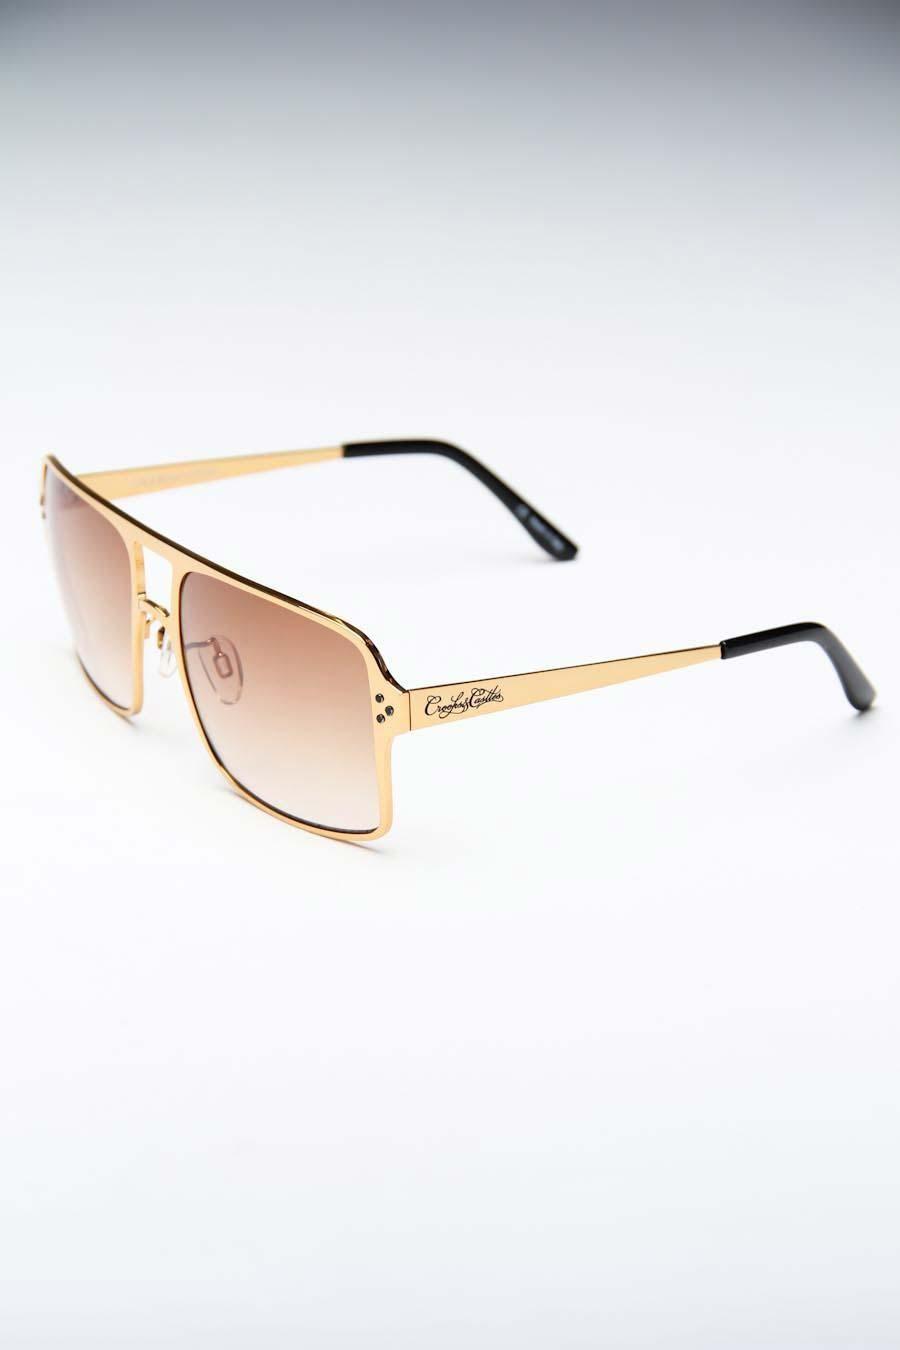 c4c3402a4395 Noriega matte gold sunglasses by Crooks and Castles